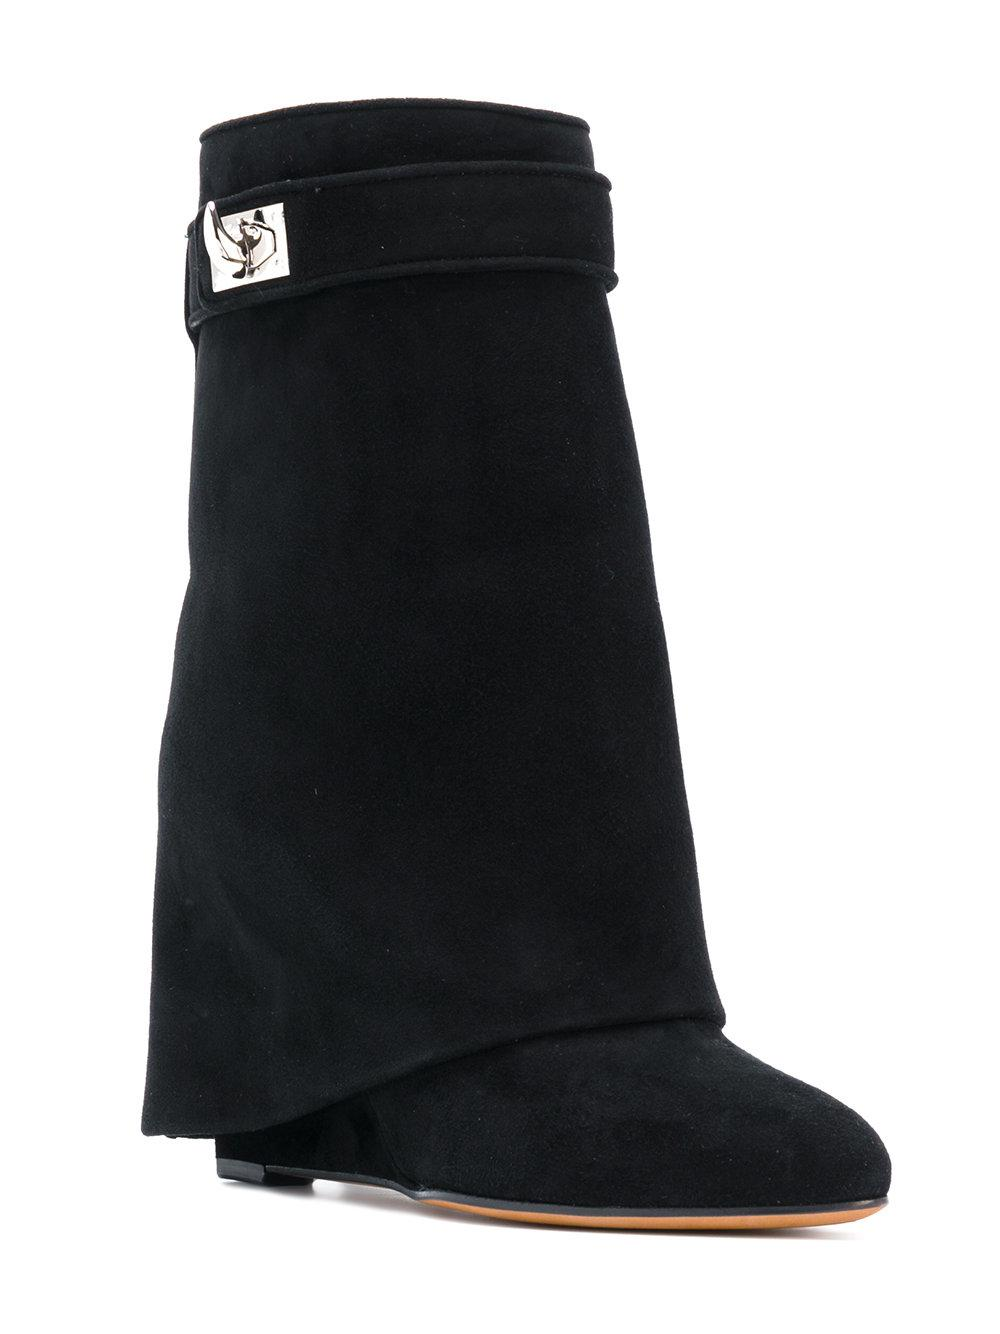 c72b26d99589 Givenchy - Black Shark Lock Boots - Lyst. View fullscreen